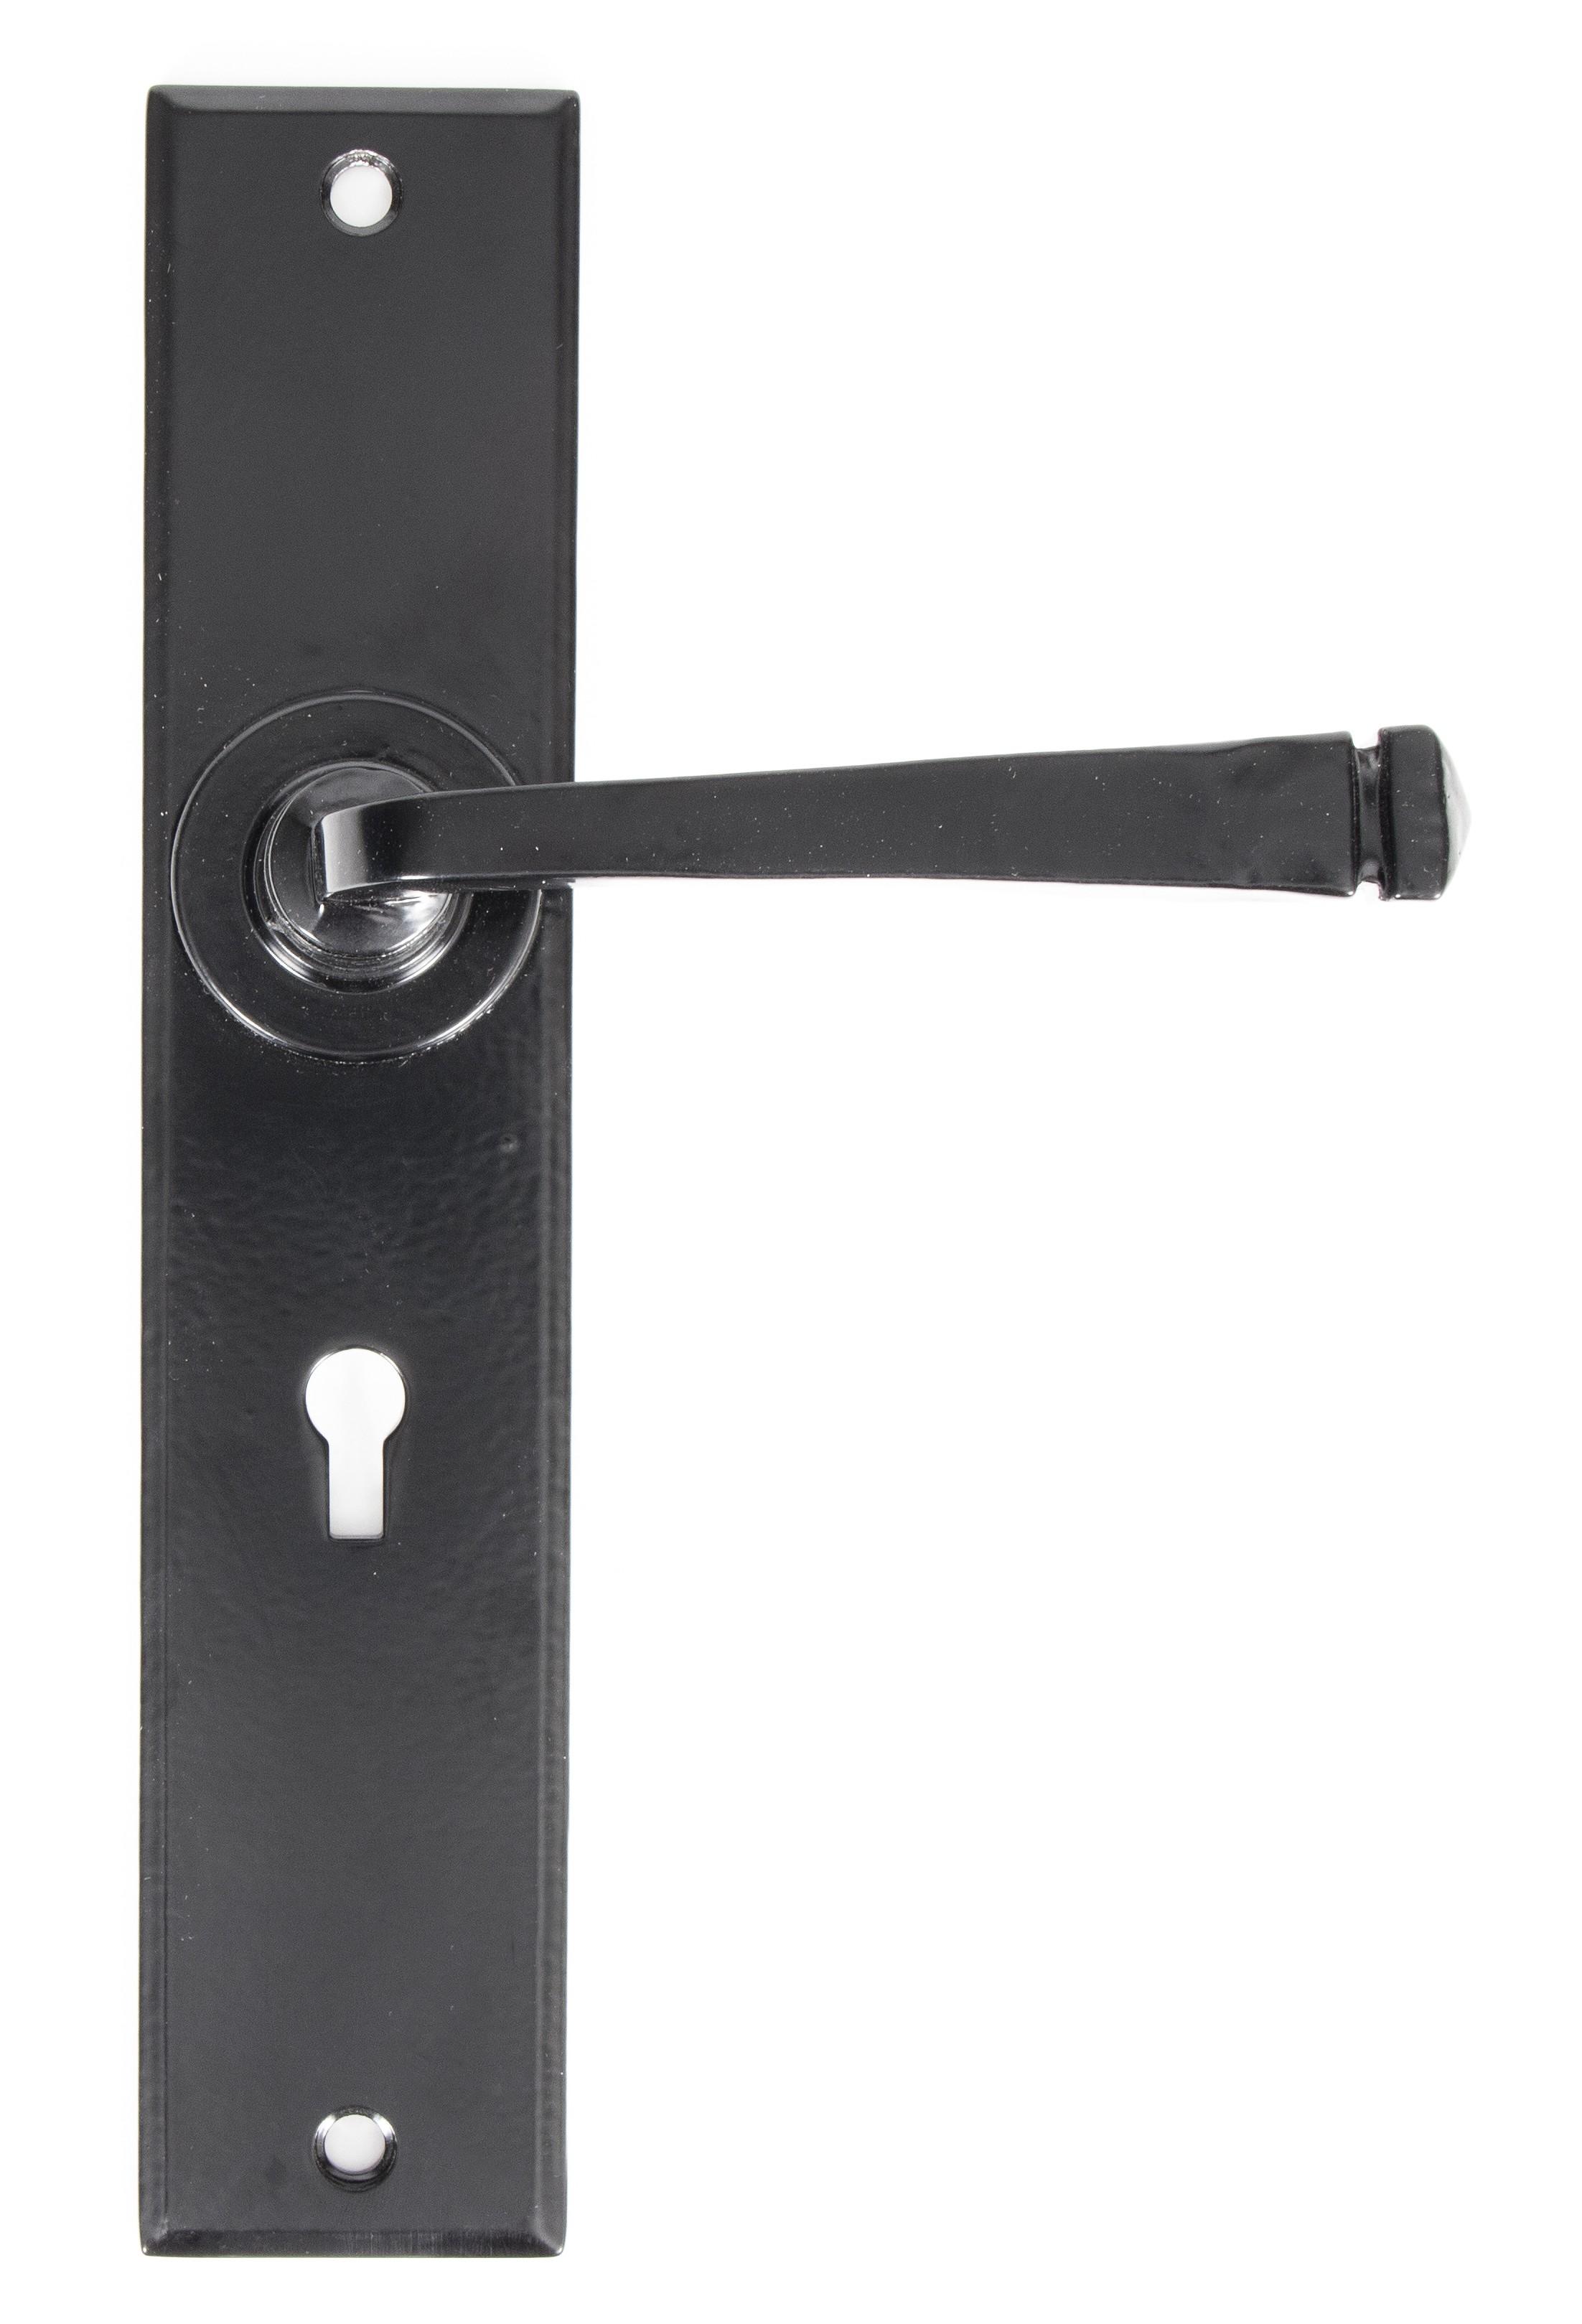 ANVIL - Black Large Avon Lever Lock Set